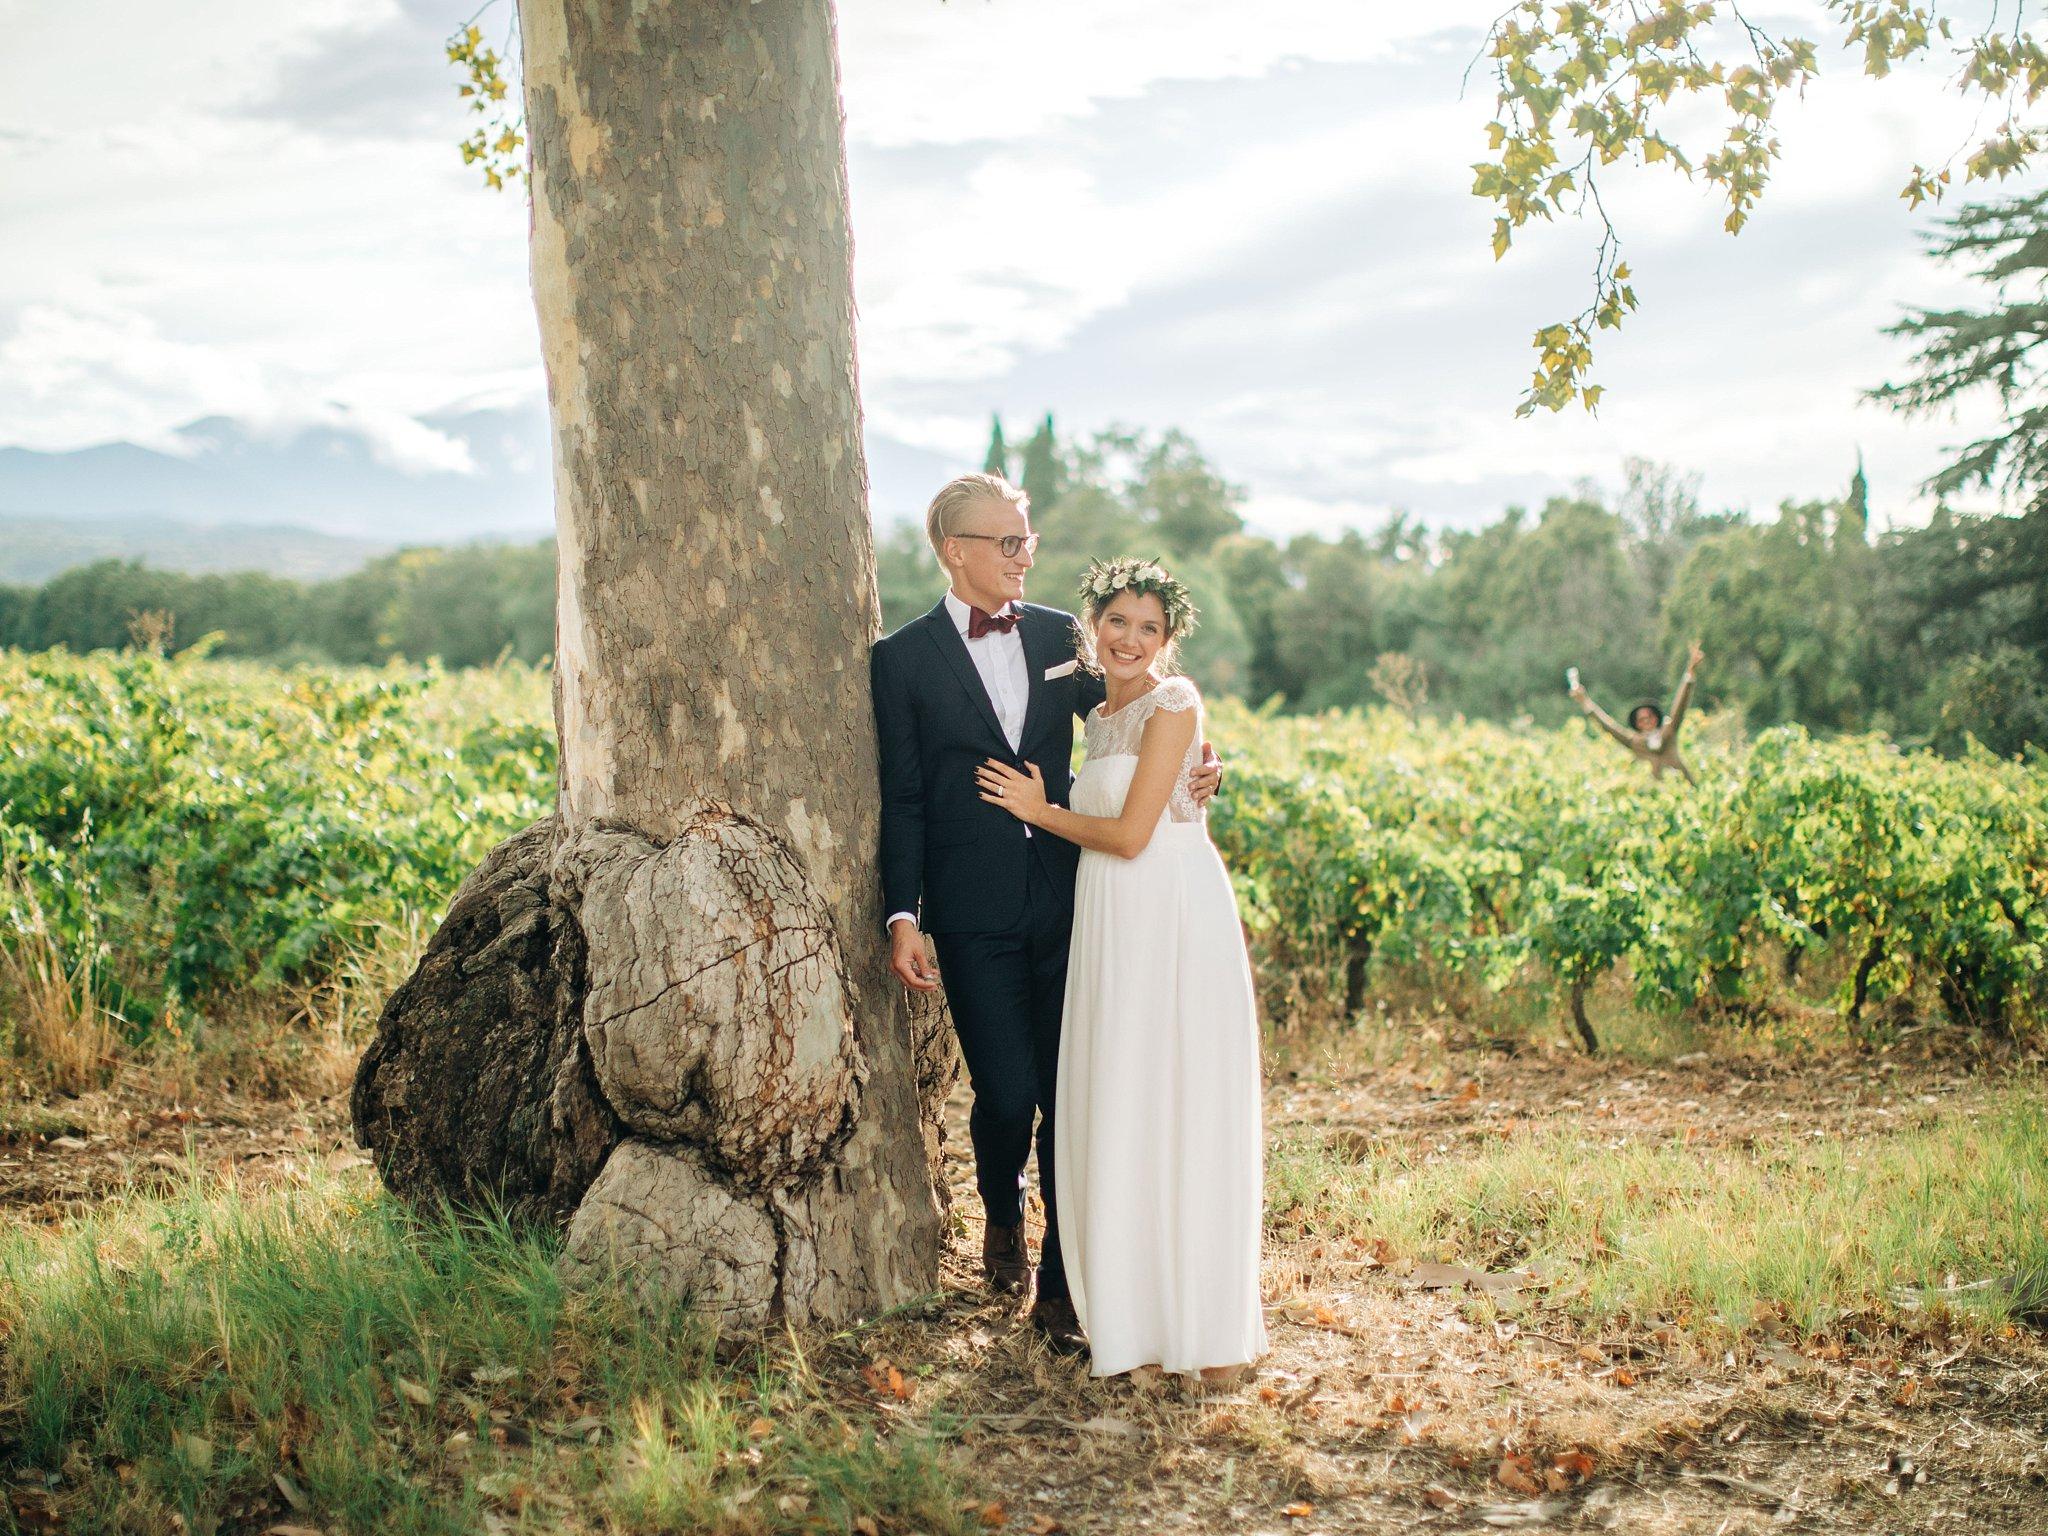 Wedding Photographer Perpignan - Château Las Collas Wedding - Hugo Hennequin089.jpg